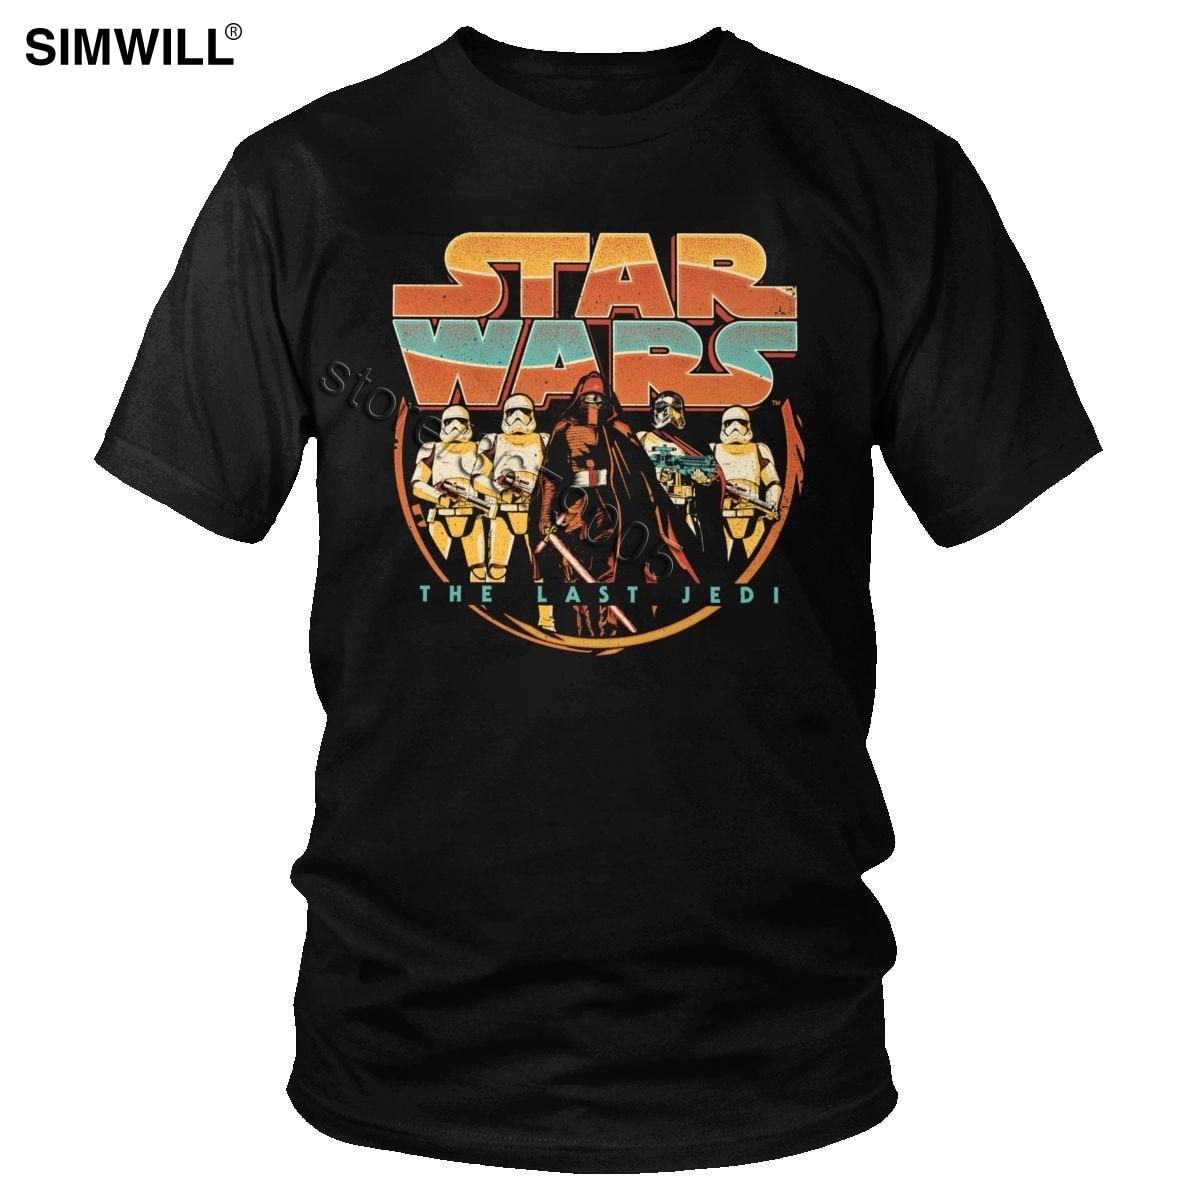 Retro Star Wars T-shirts Men Print Short Sleeved Cotton Kylo Ren T shirt Round Neck The Last Jedi Tees Custom Graphic Tops